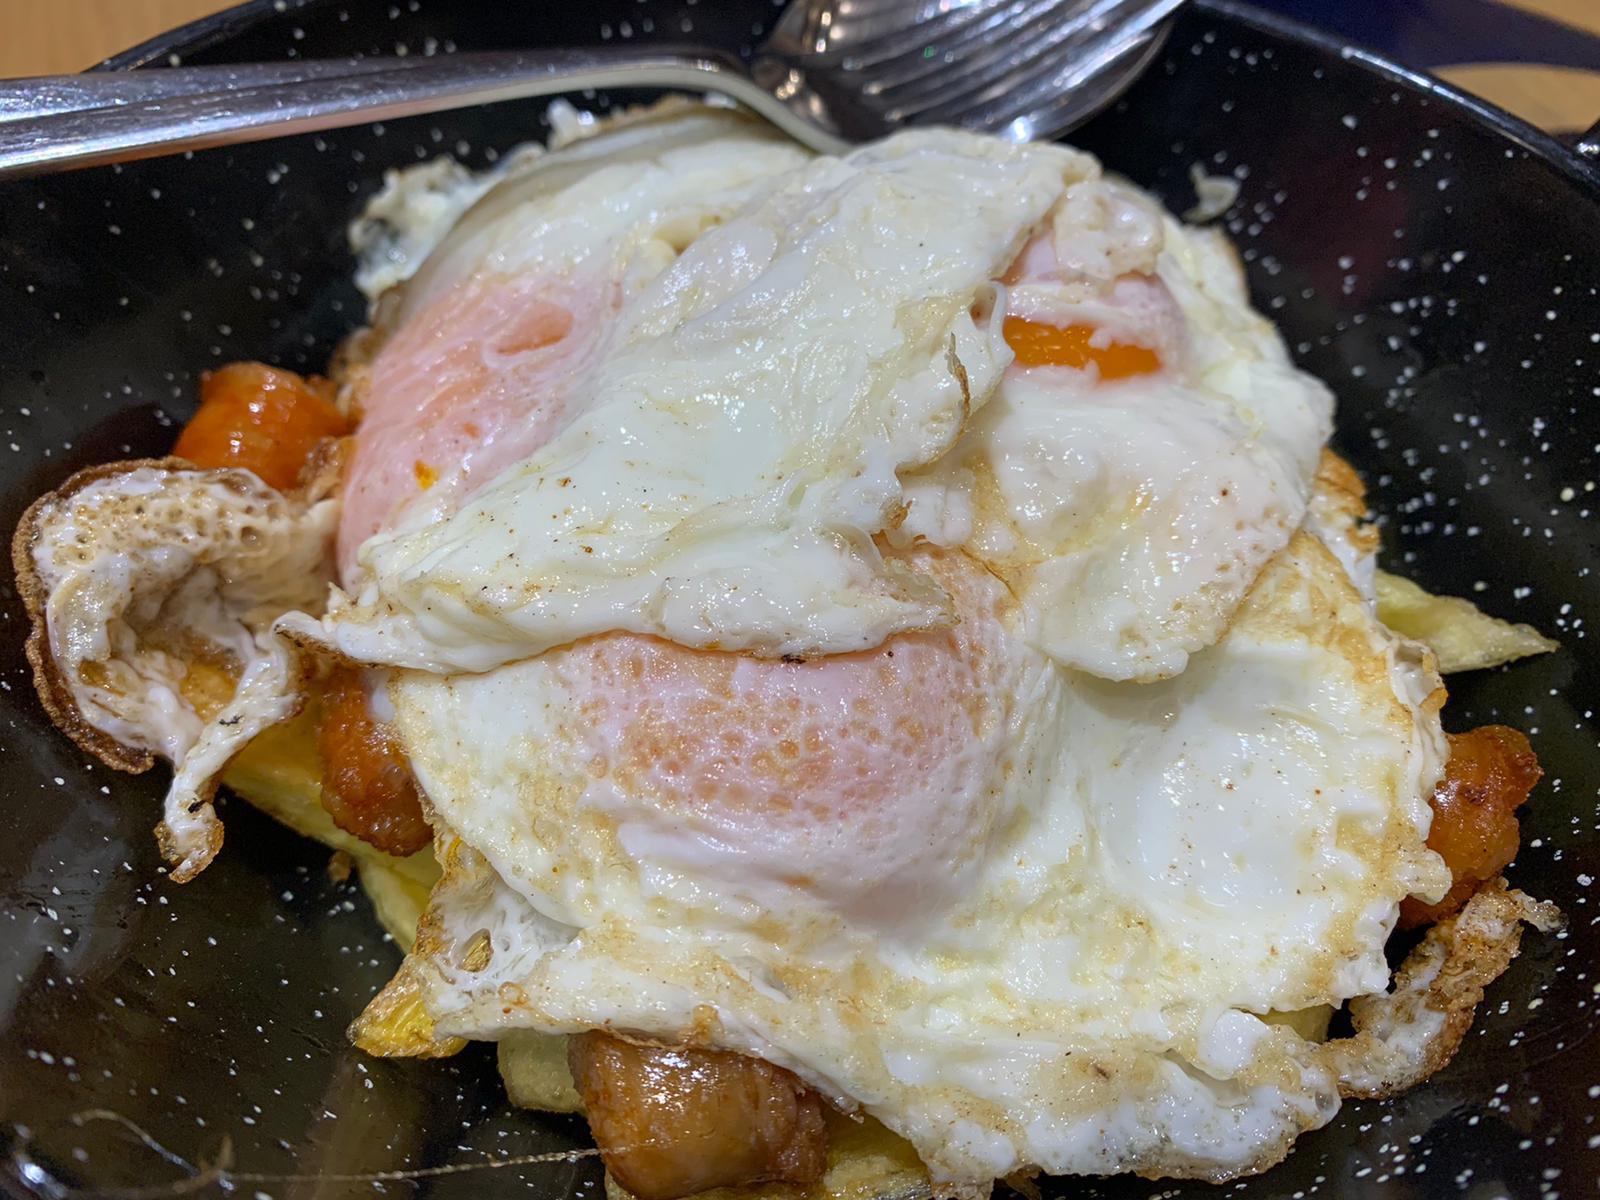 Huevos rotos con txistorra